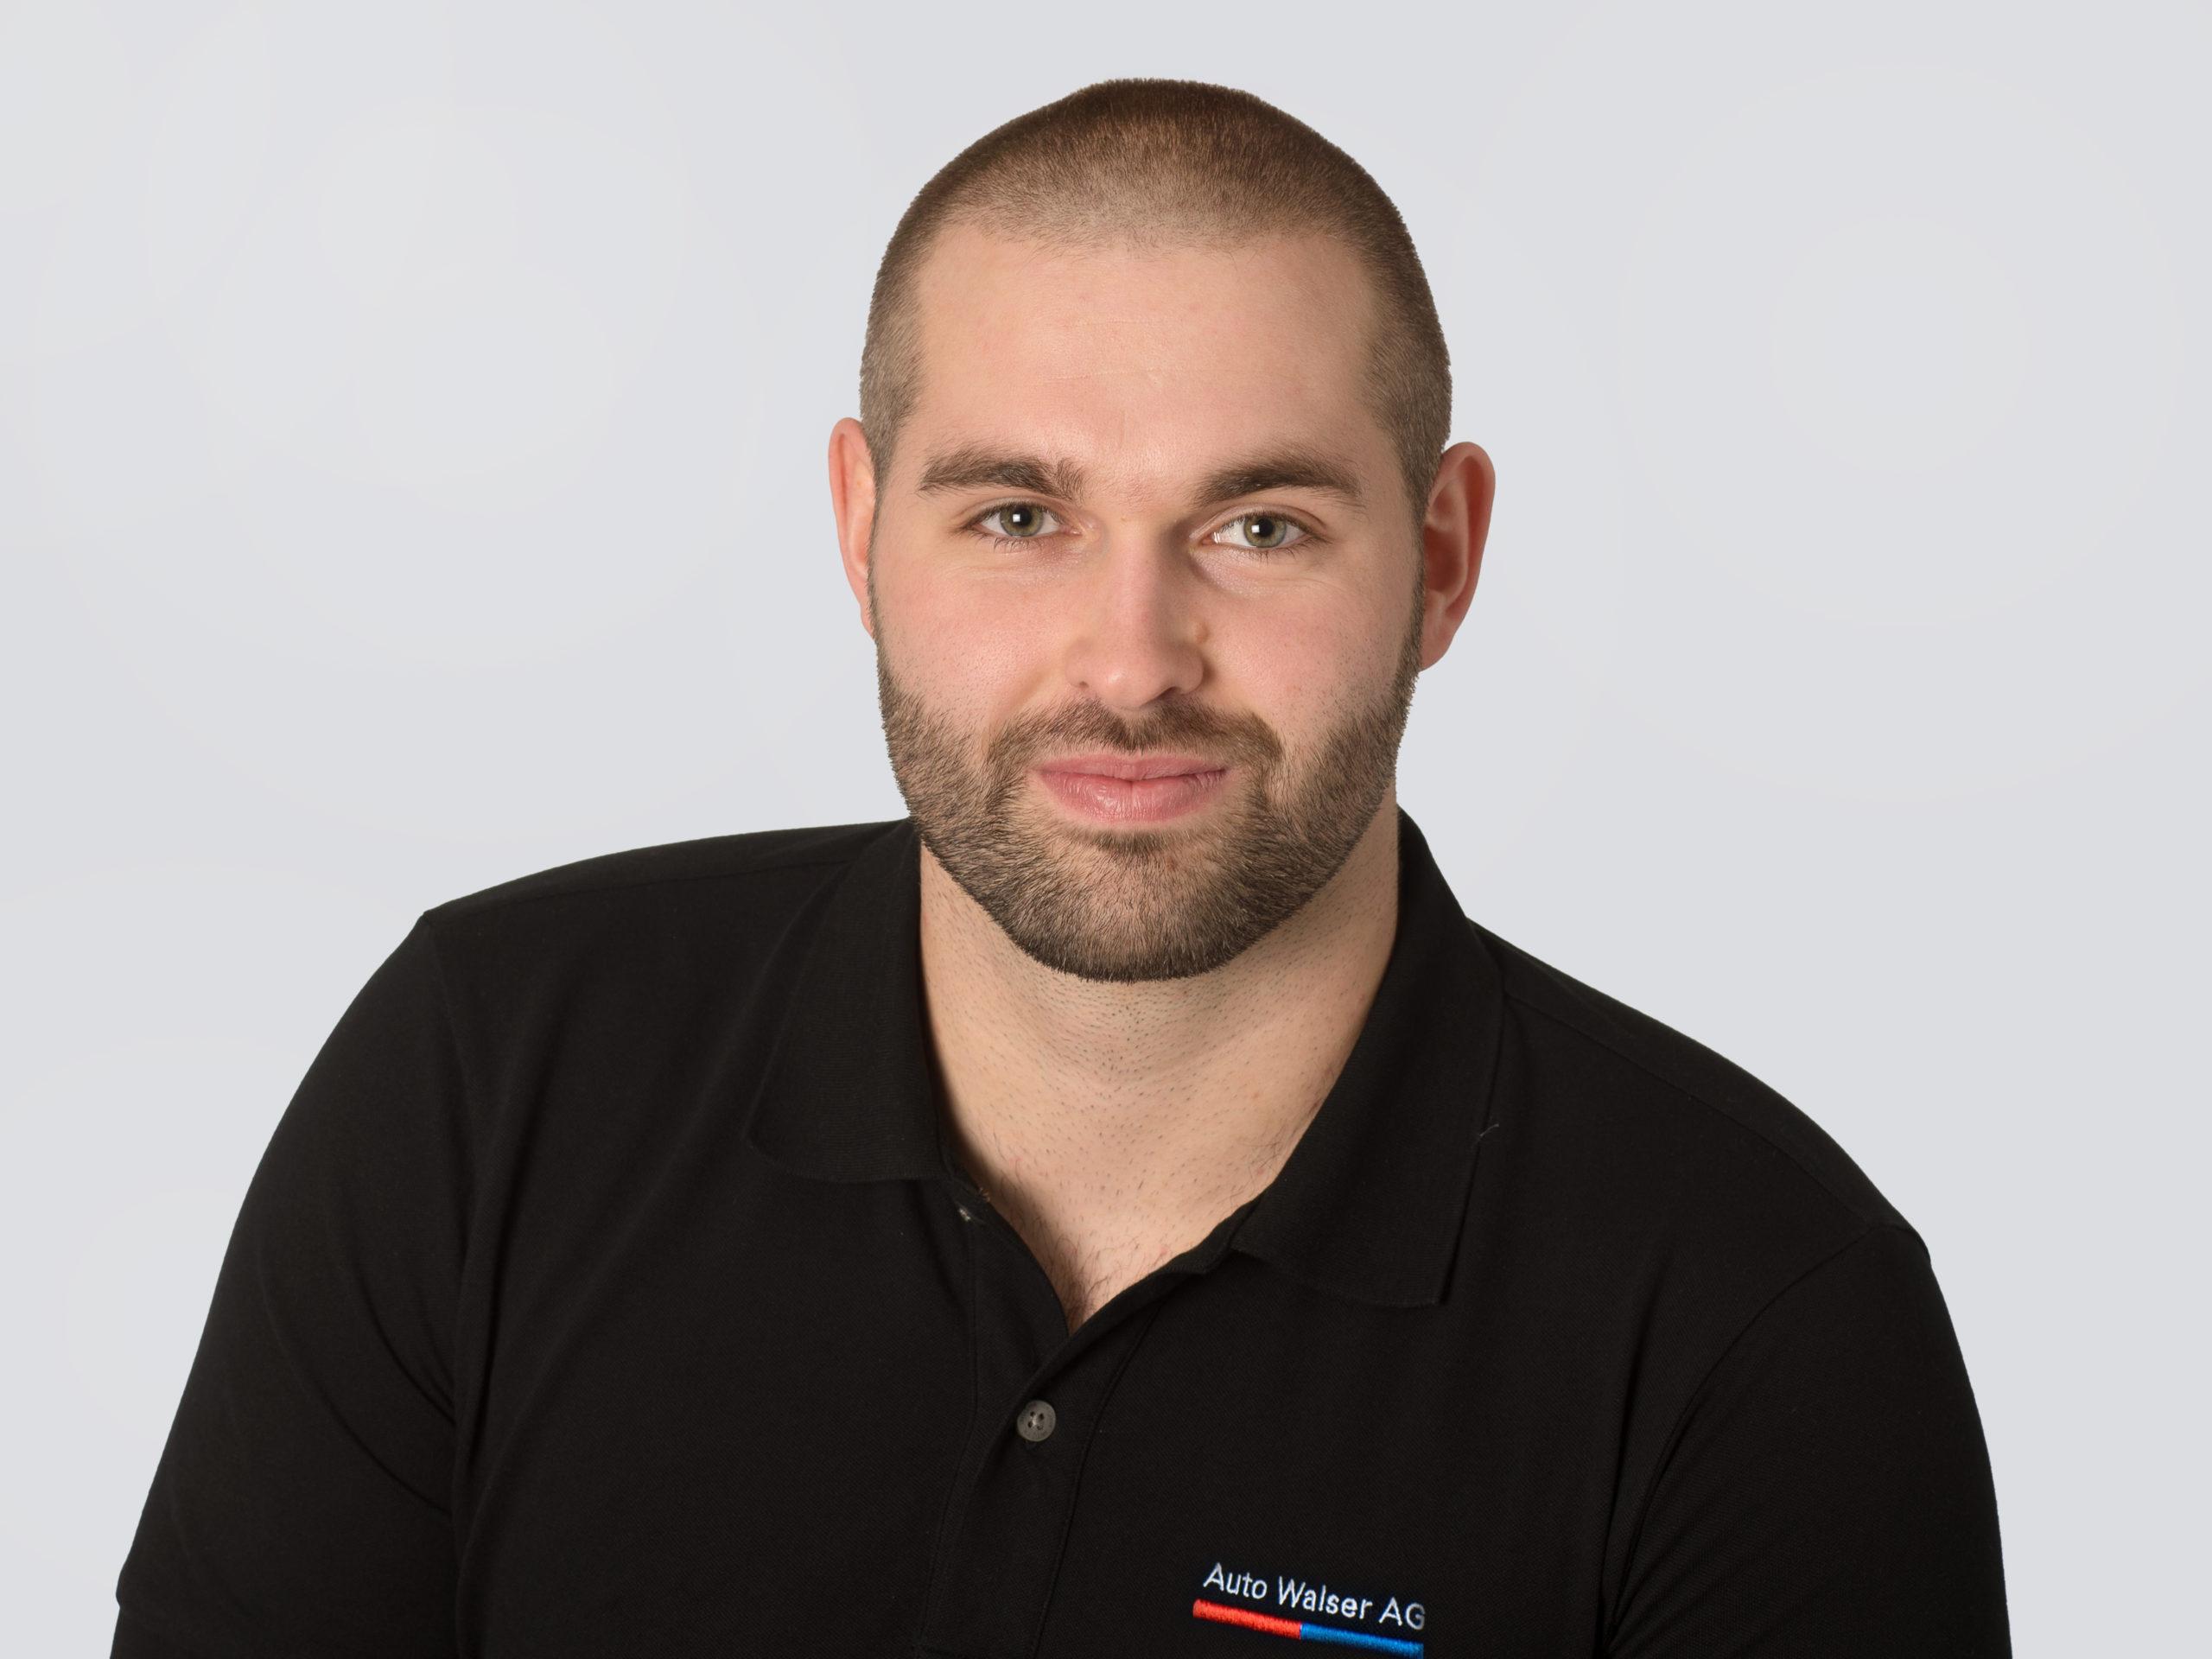 Miroslav Krstic : Automobilmechatroniker